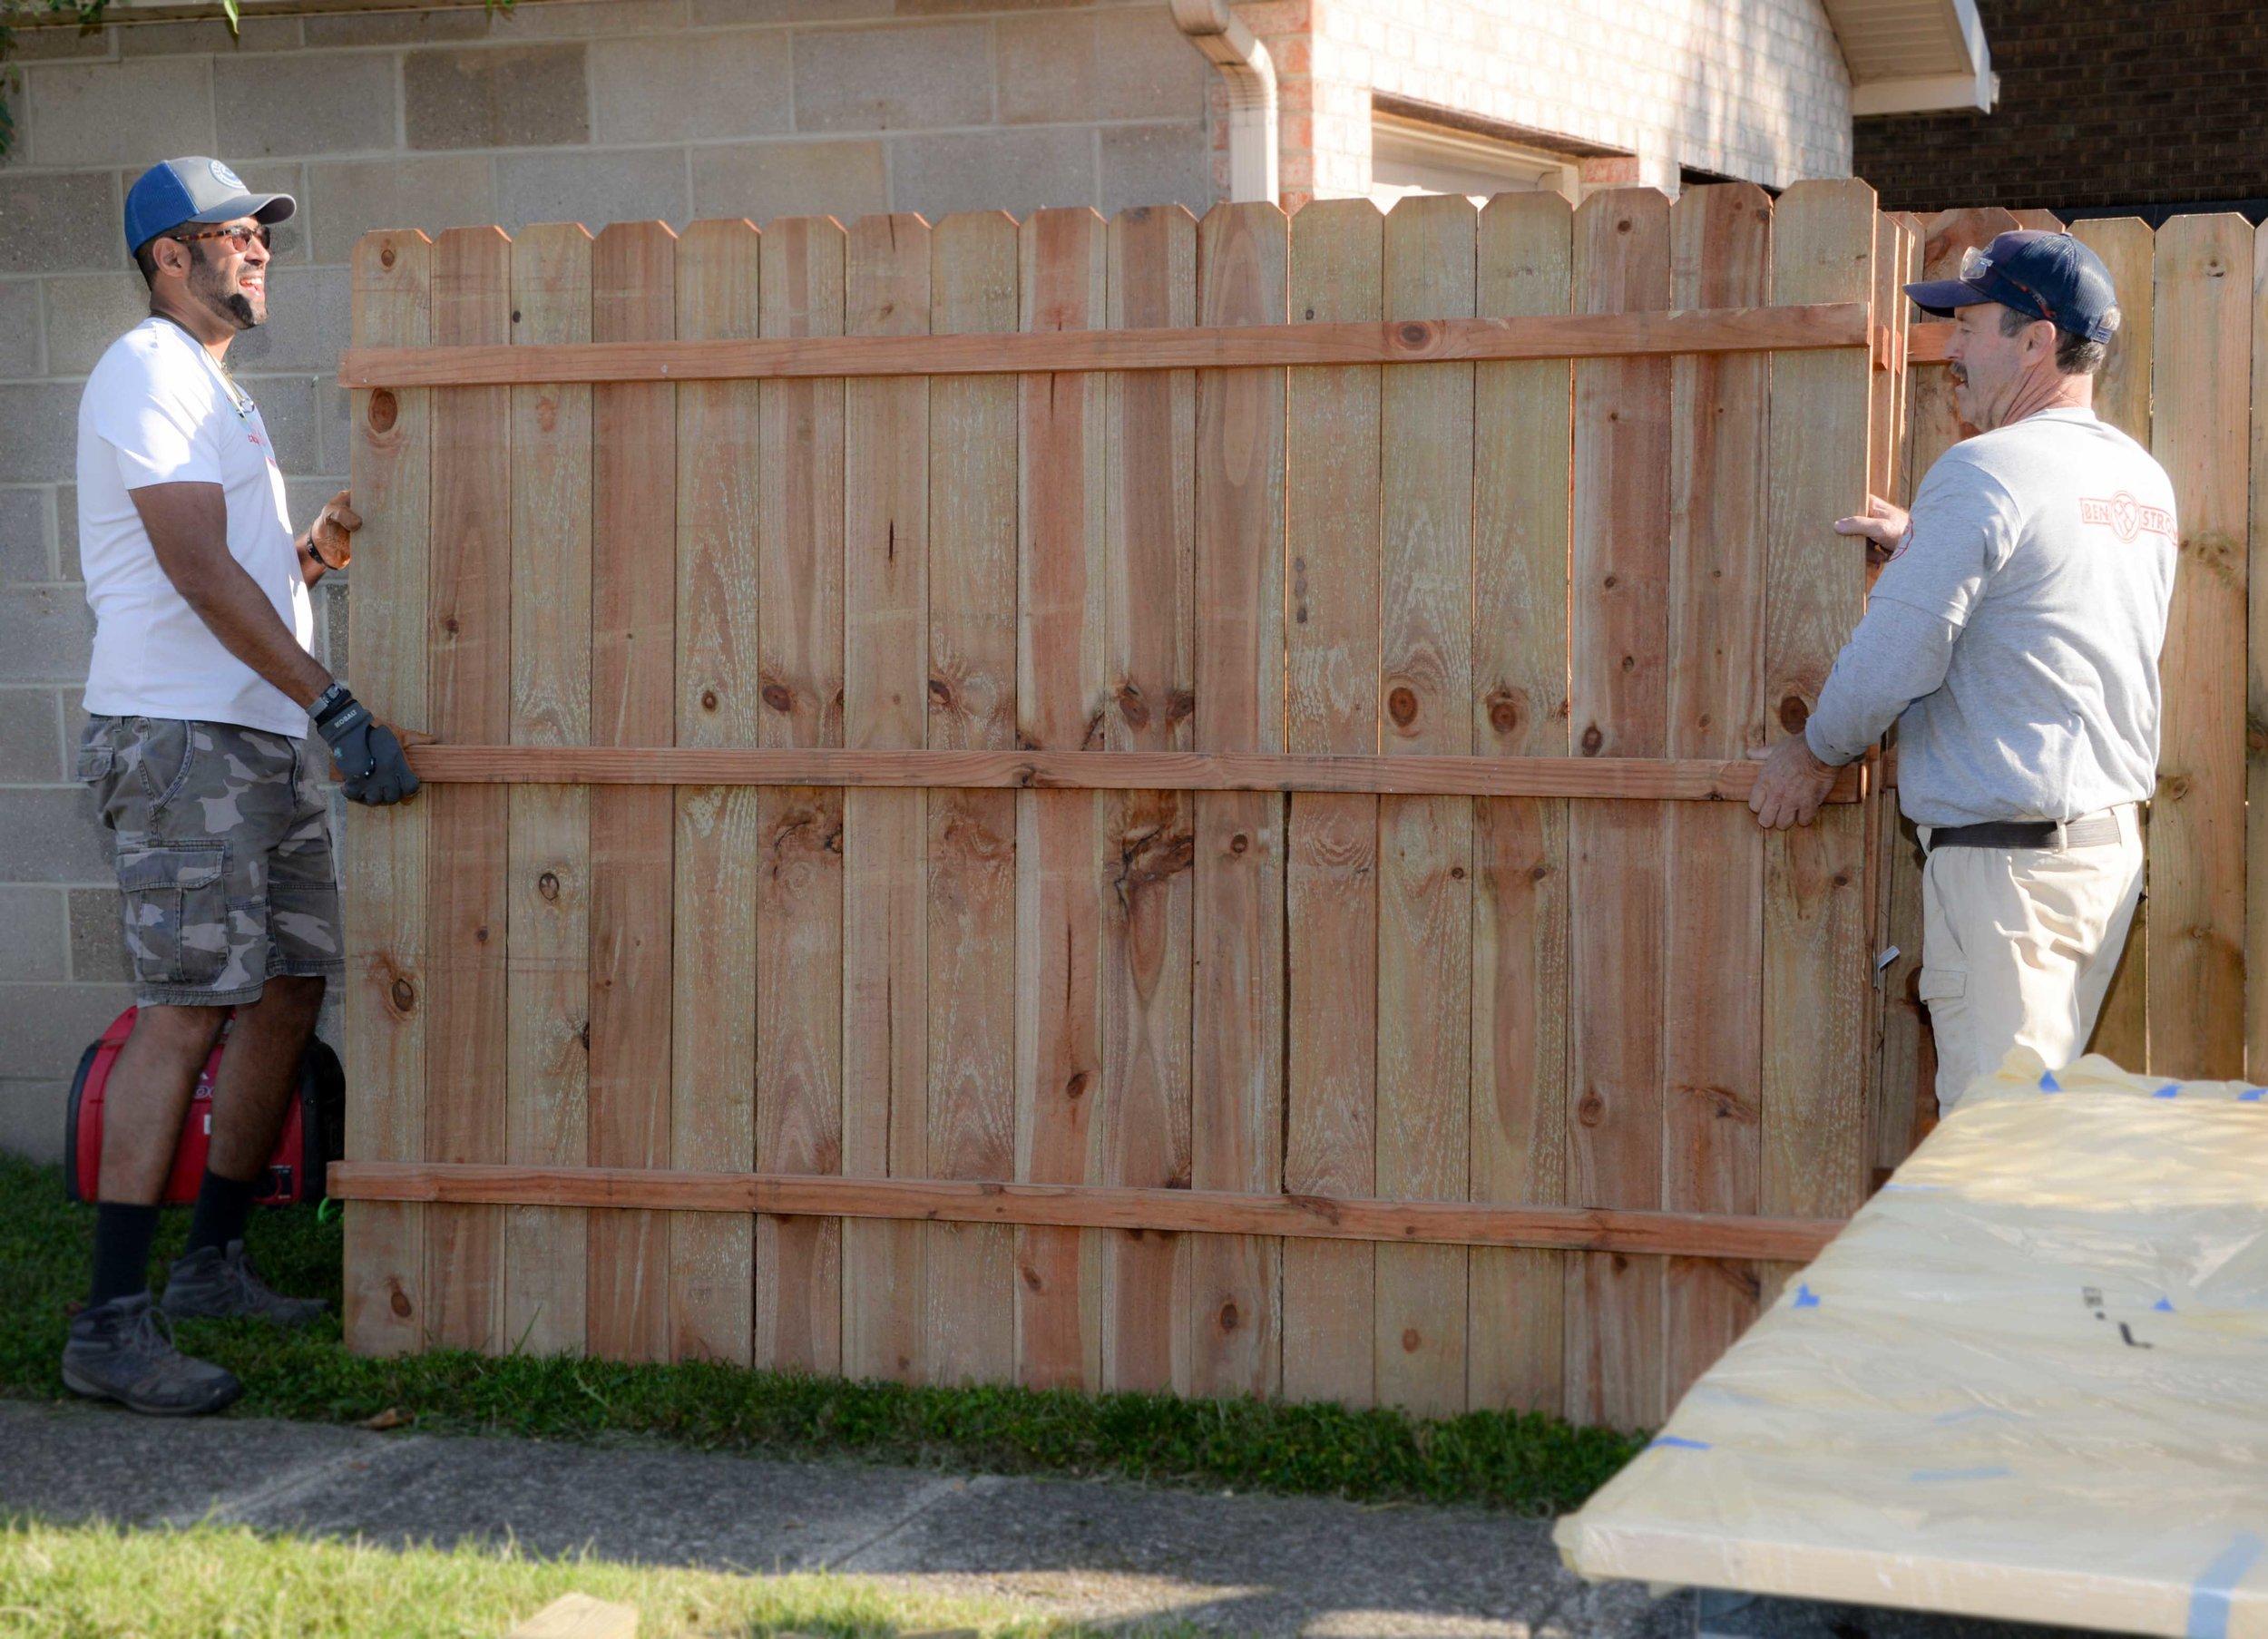 guys-moving-fence.jpg